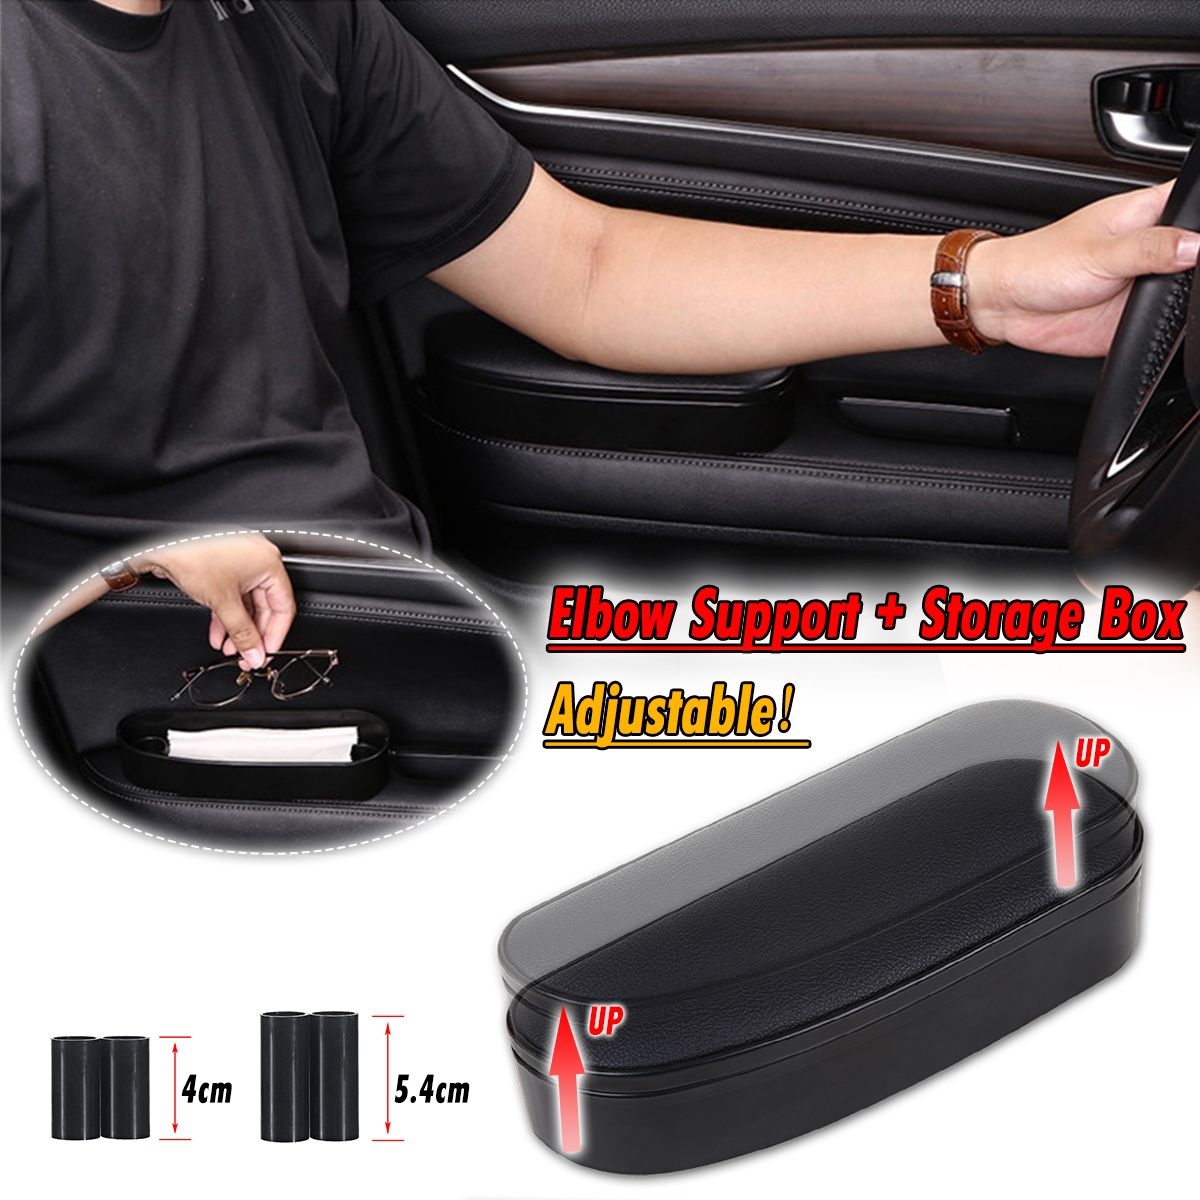 3 in 1 Anti Slip Mat Storage box Adjustable Car Elbow Support Left Hand Armrest Support